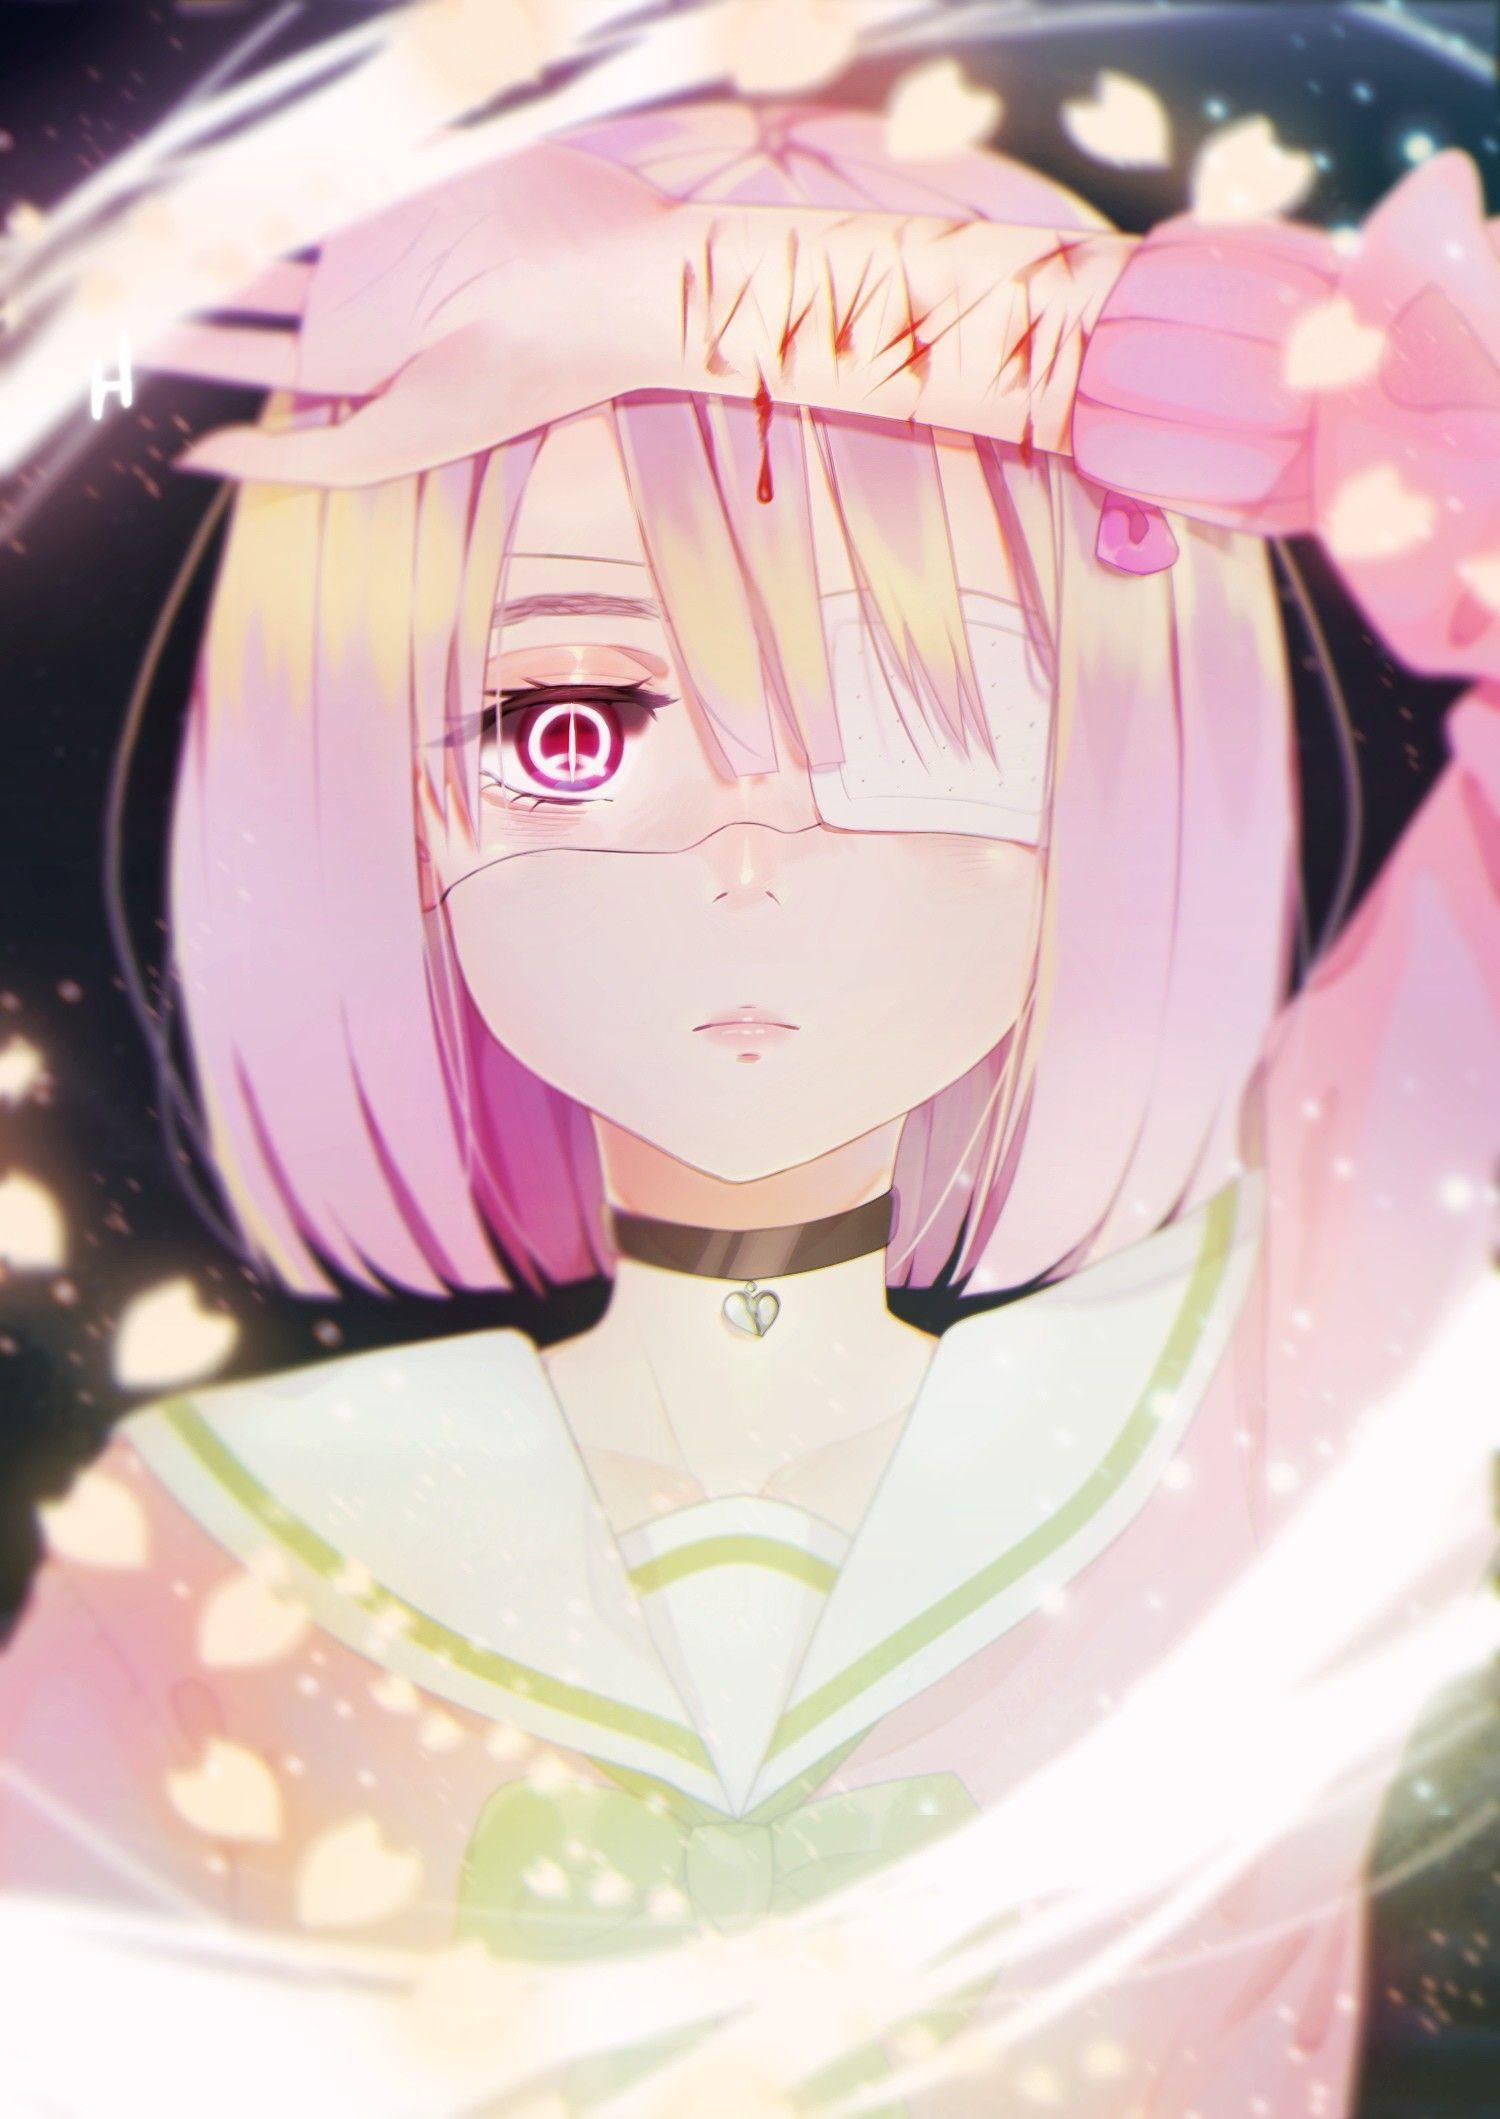 aesthetic pink dark anime aesthetic aestheticallypleasing chillvibes 美的アニメ 悲しいアニメガール ダークなアニメ